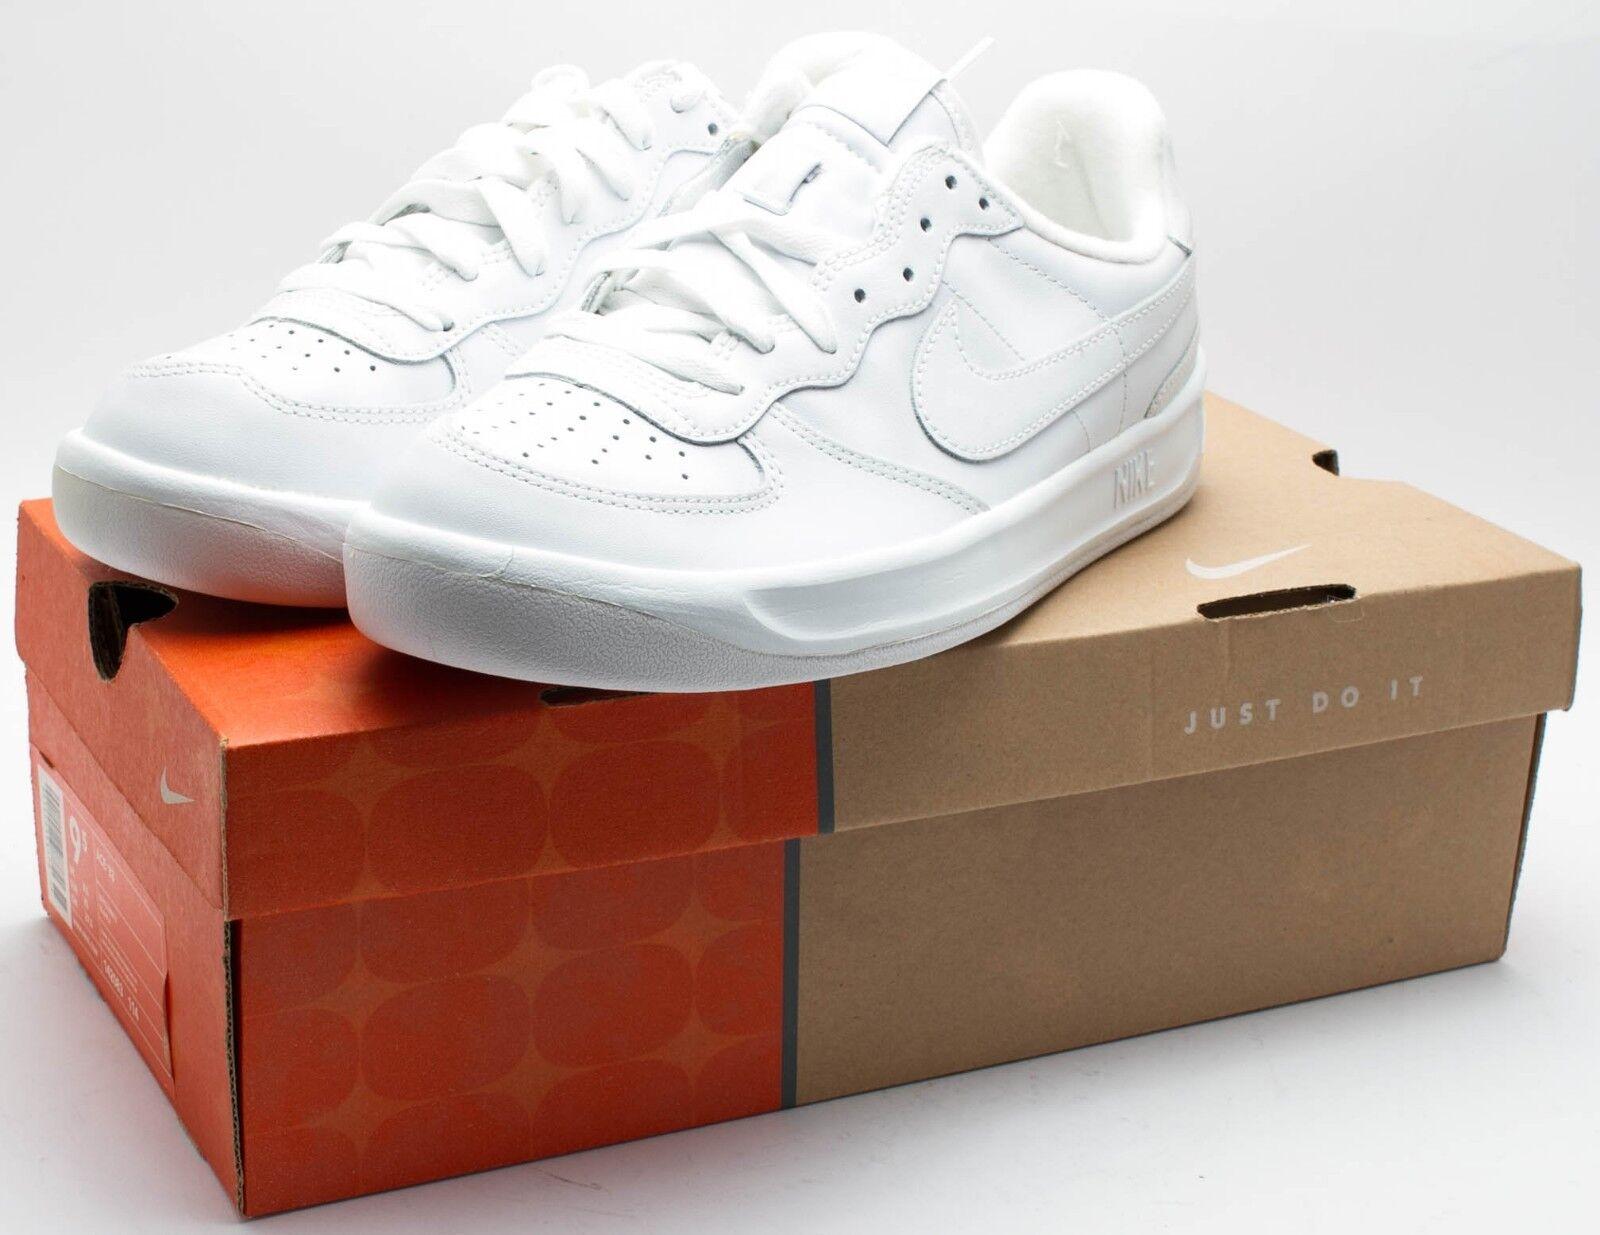 Nike Herren Vintage 142083-114 2000 ACE '83 Schuhe 142083-114 Vintage weiß sz-10.5 0f3e29